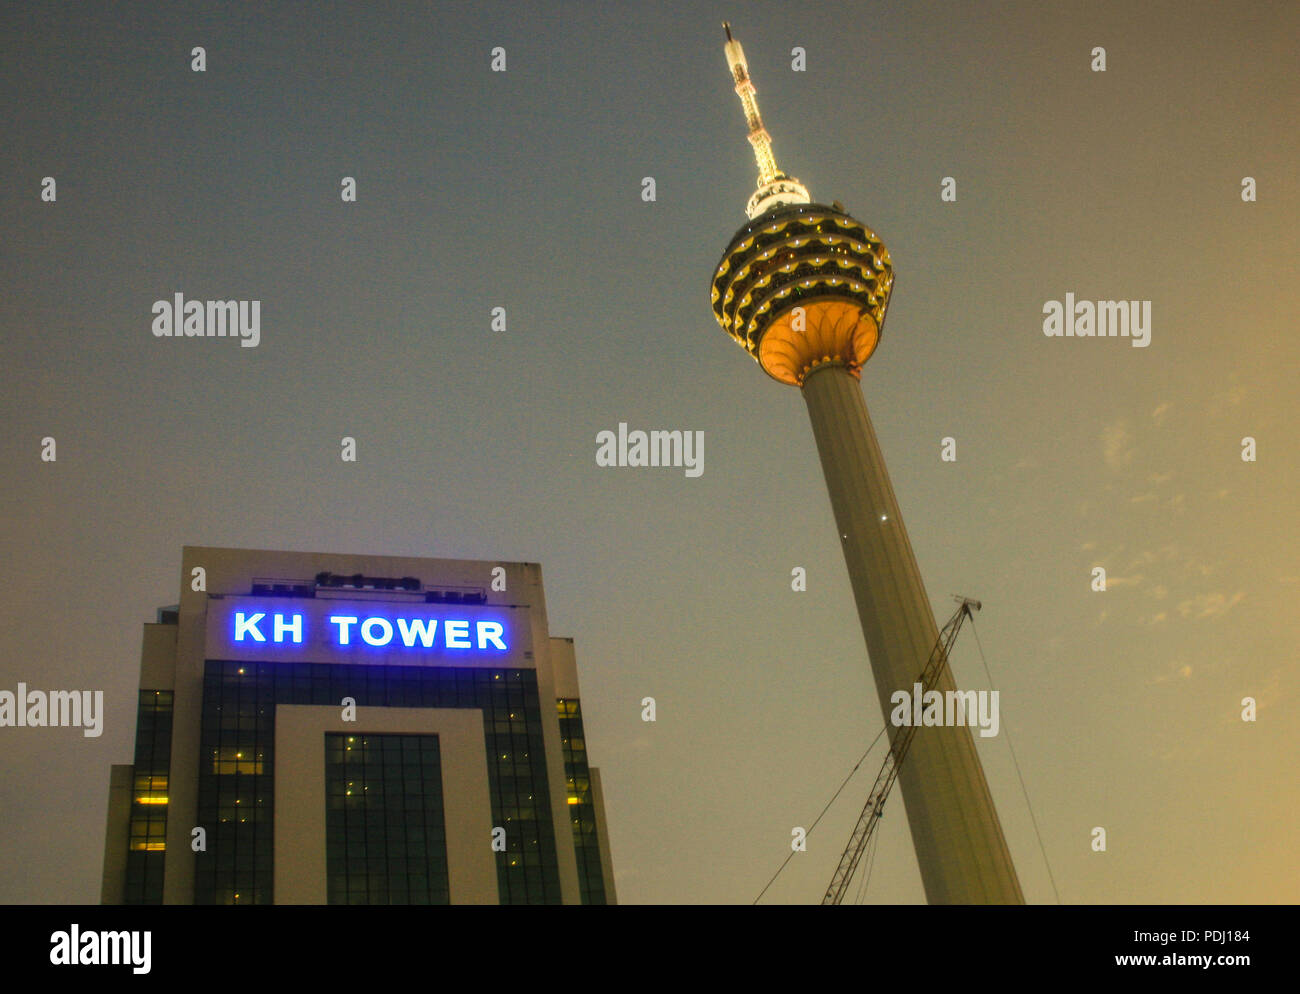 KL Menara tower, Kuala Lumpur City Centre, Malaysia - Stock Image